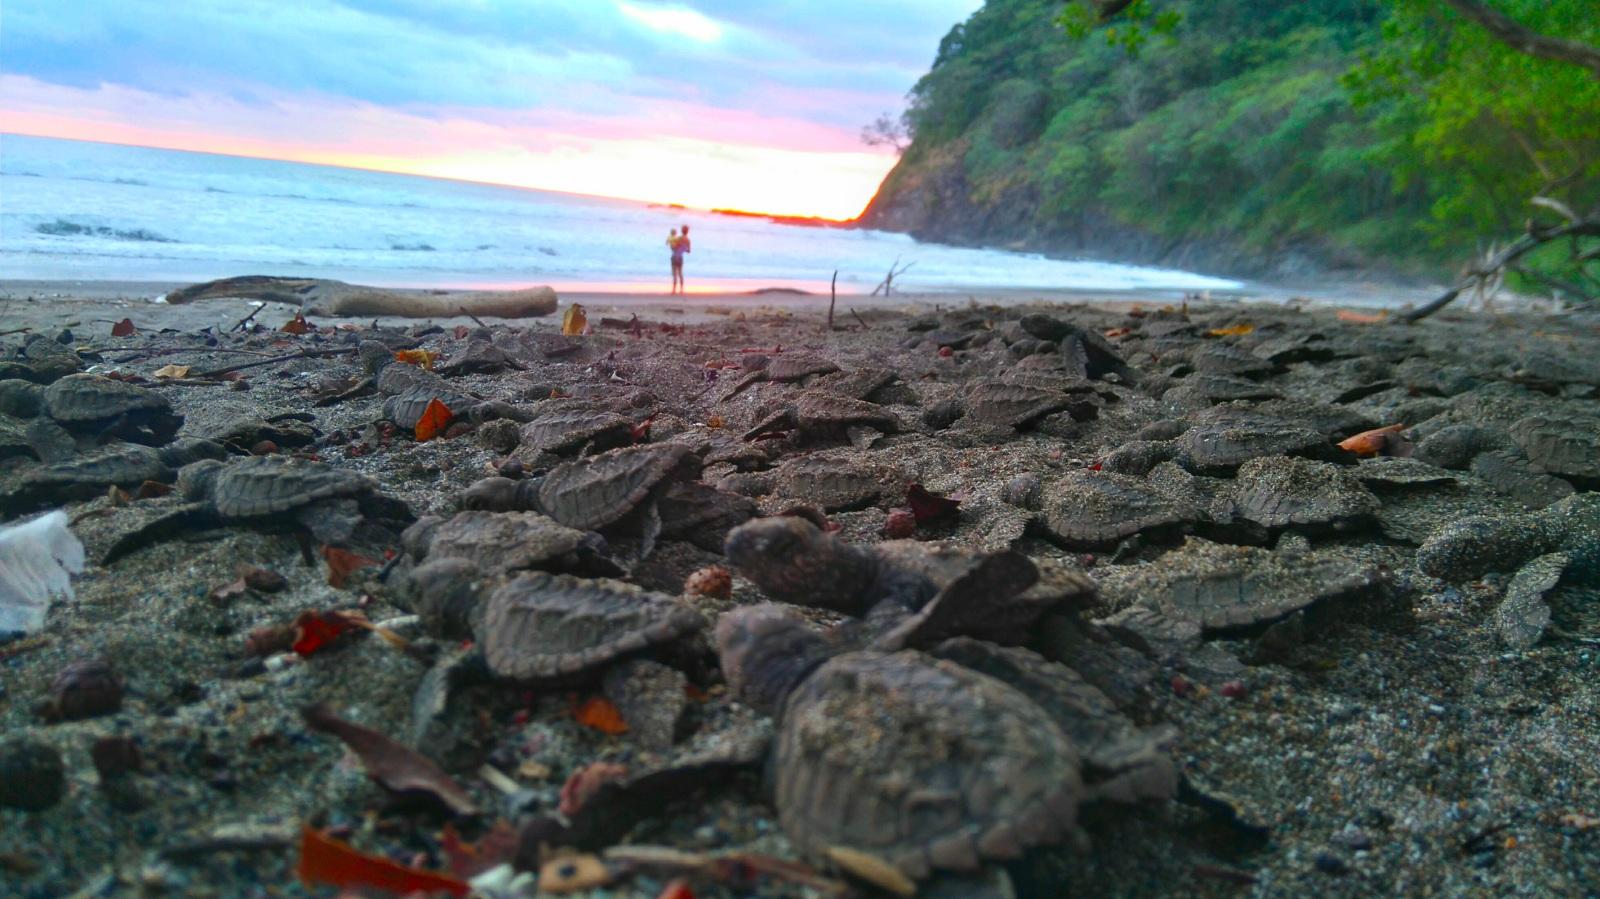 Playa de Corozalito, Guanacaste Costa Rica